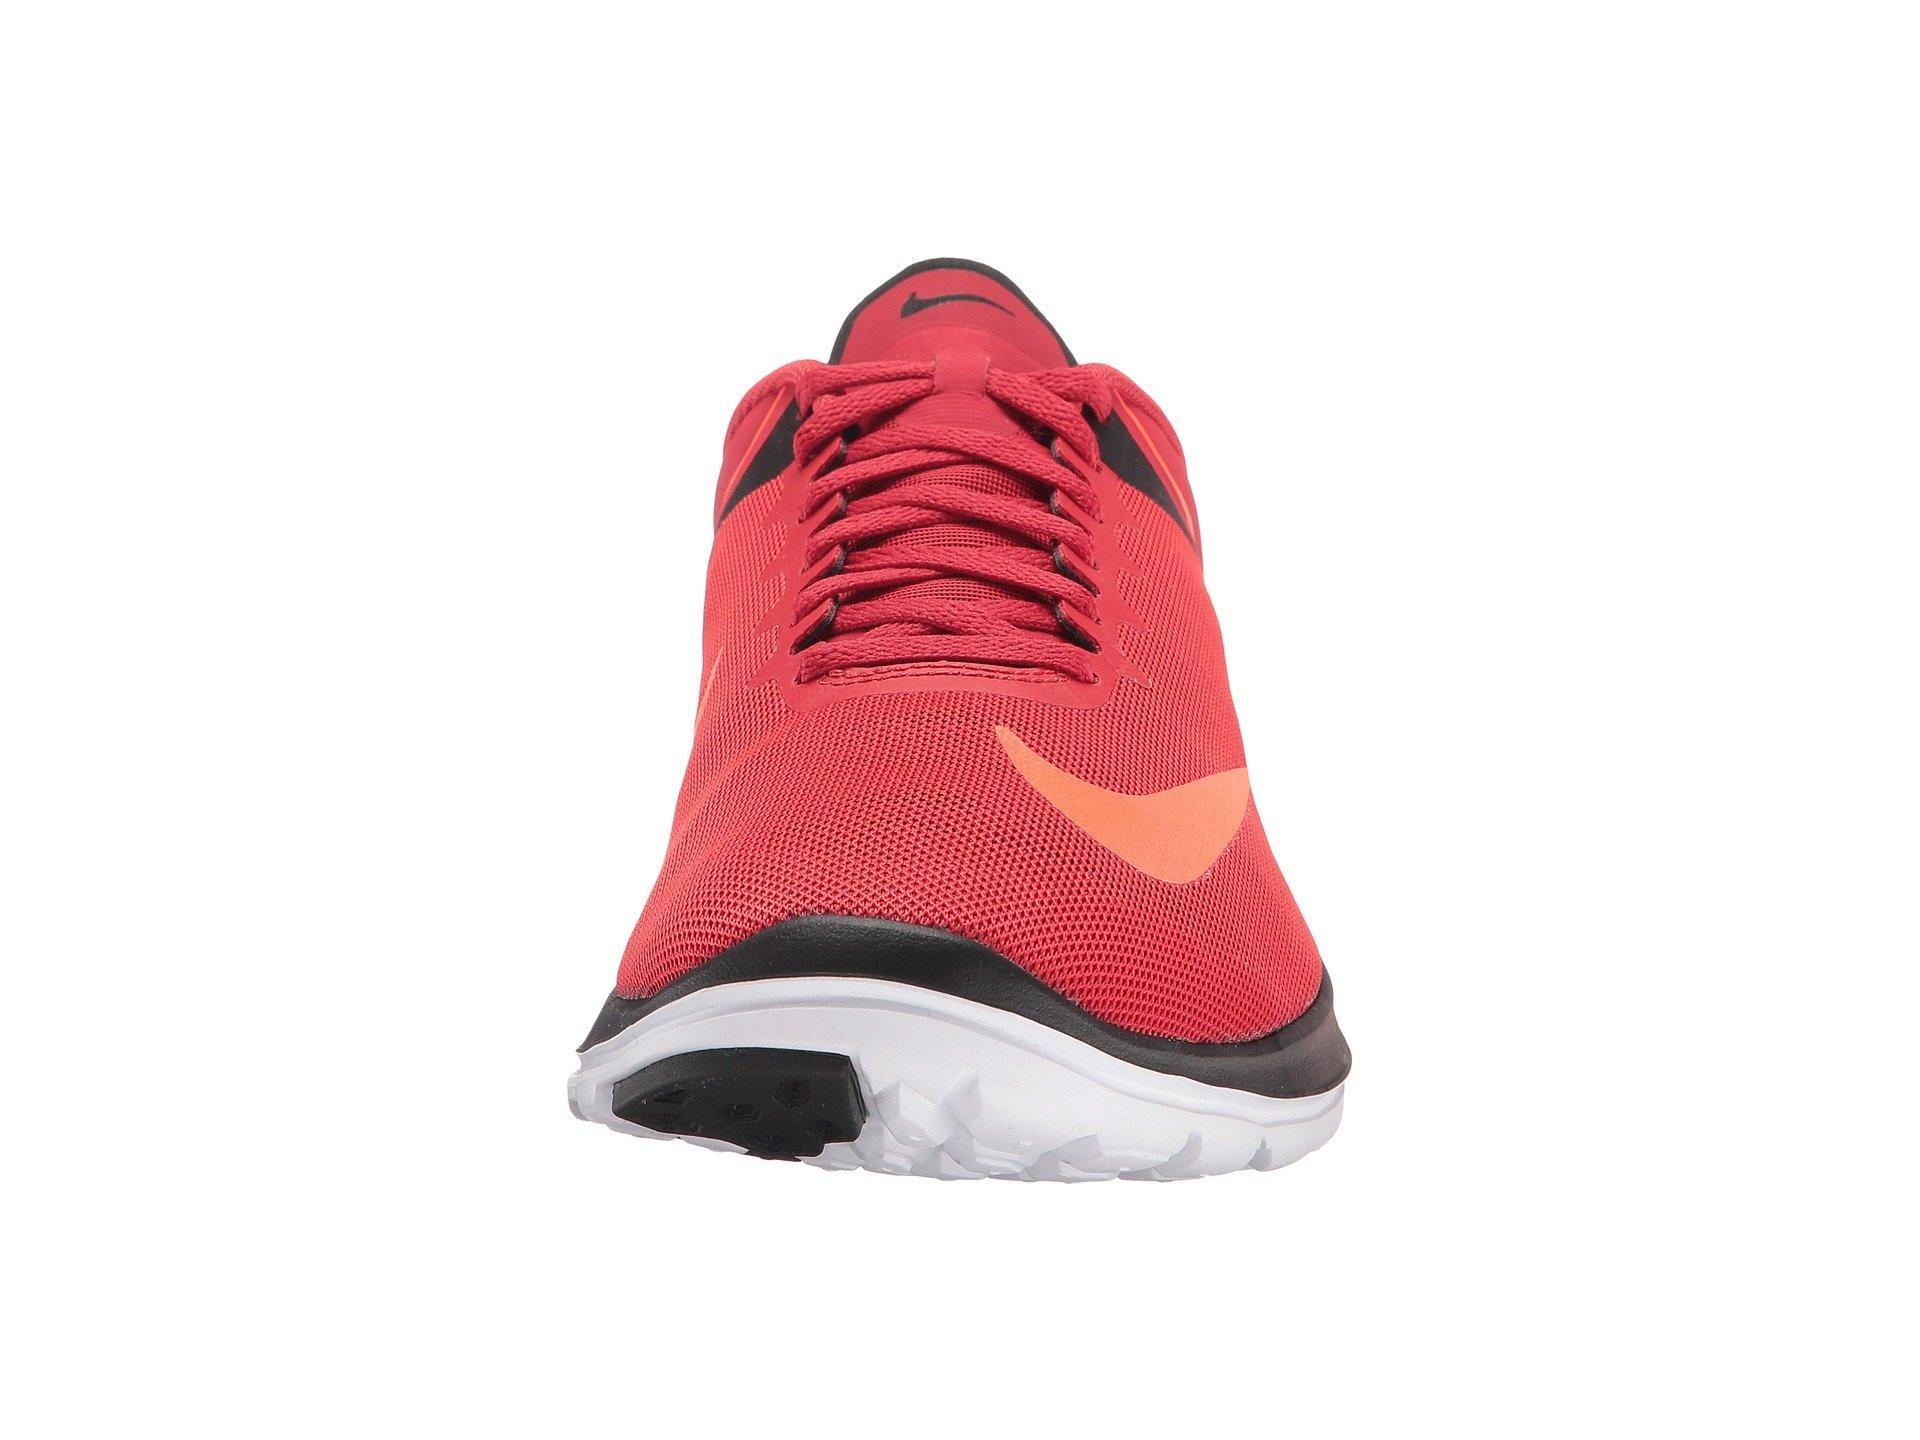 9ab8e9fdc74 Lyst - Nike Fs Lite Run 4 in Red for Men